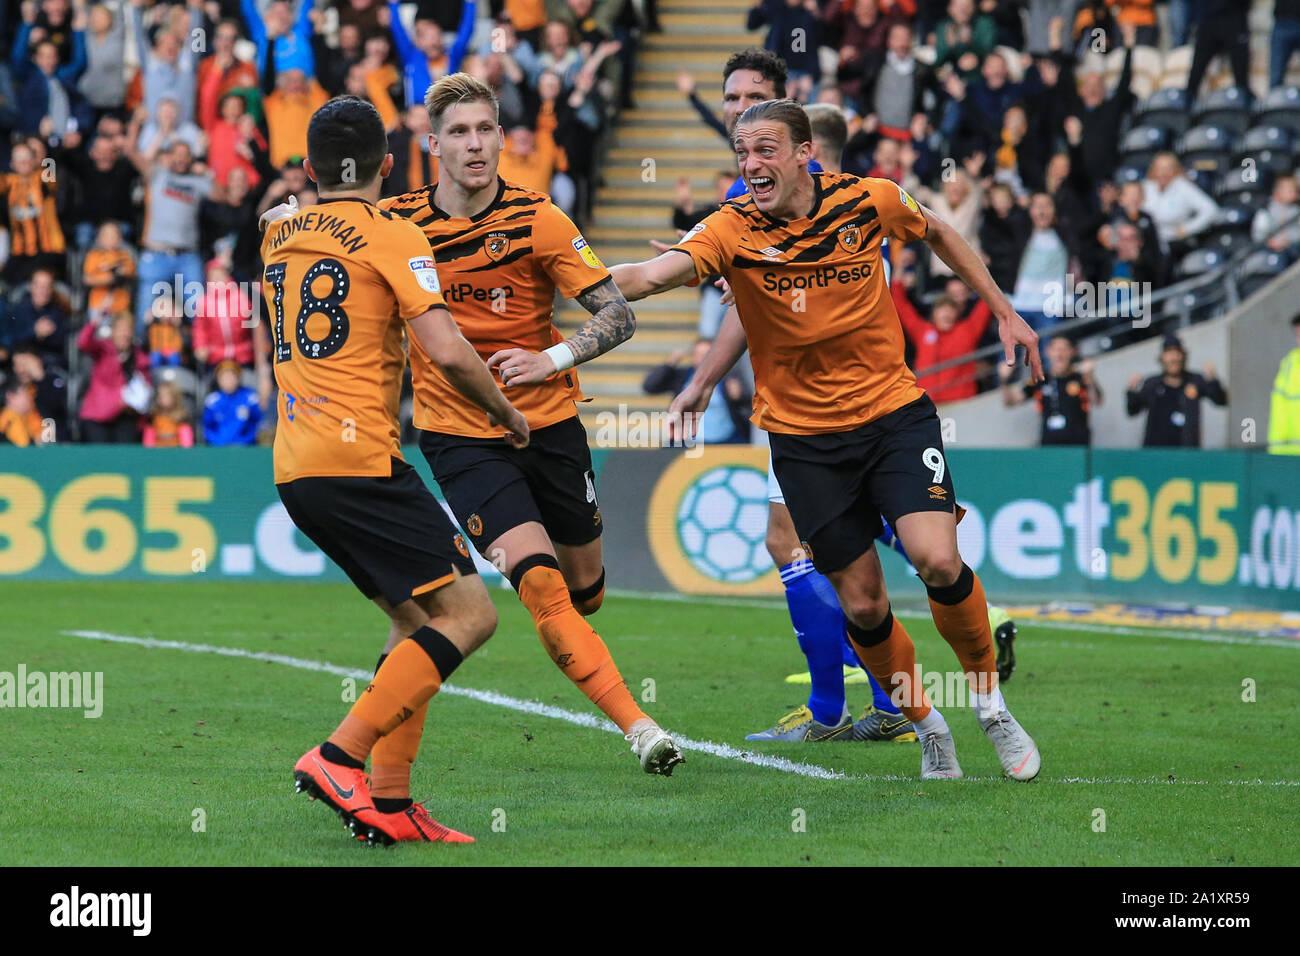 Hull city vs cardiff betting preview goal solar tab australia betting